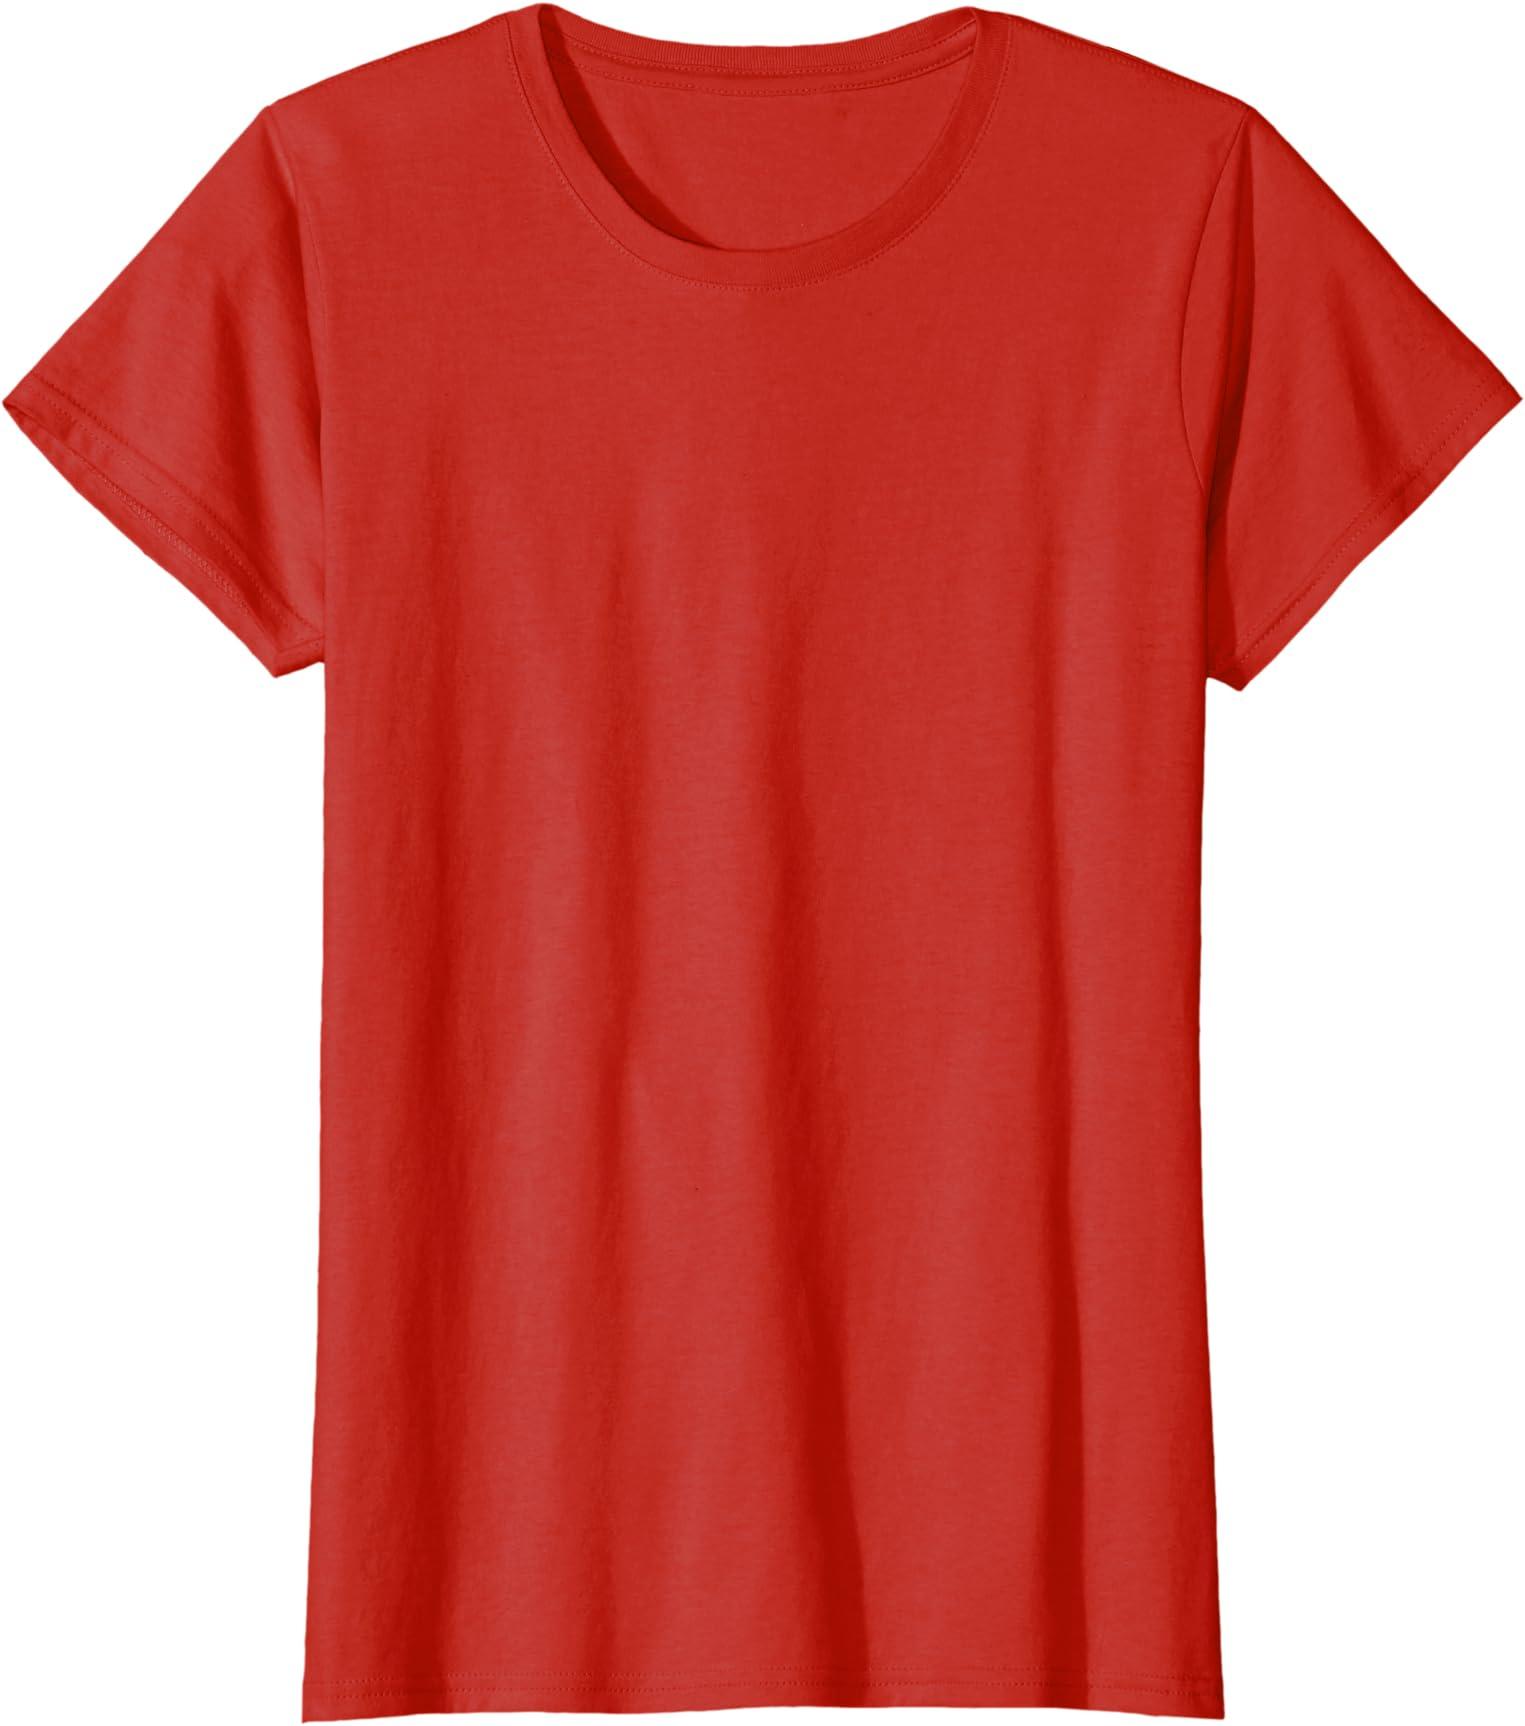 Men/_s T-Shirt by American Apparel Black Hooded Sweatshirt-Shirt Little Hearts Valentine Love Lover